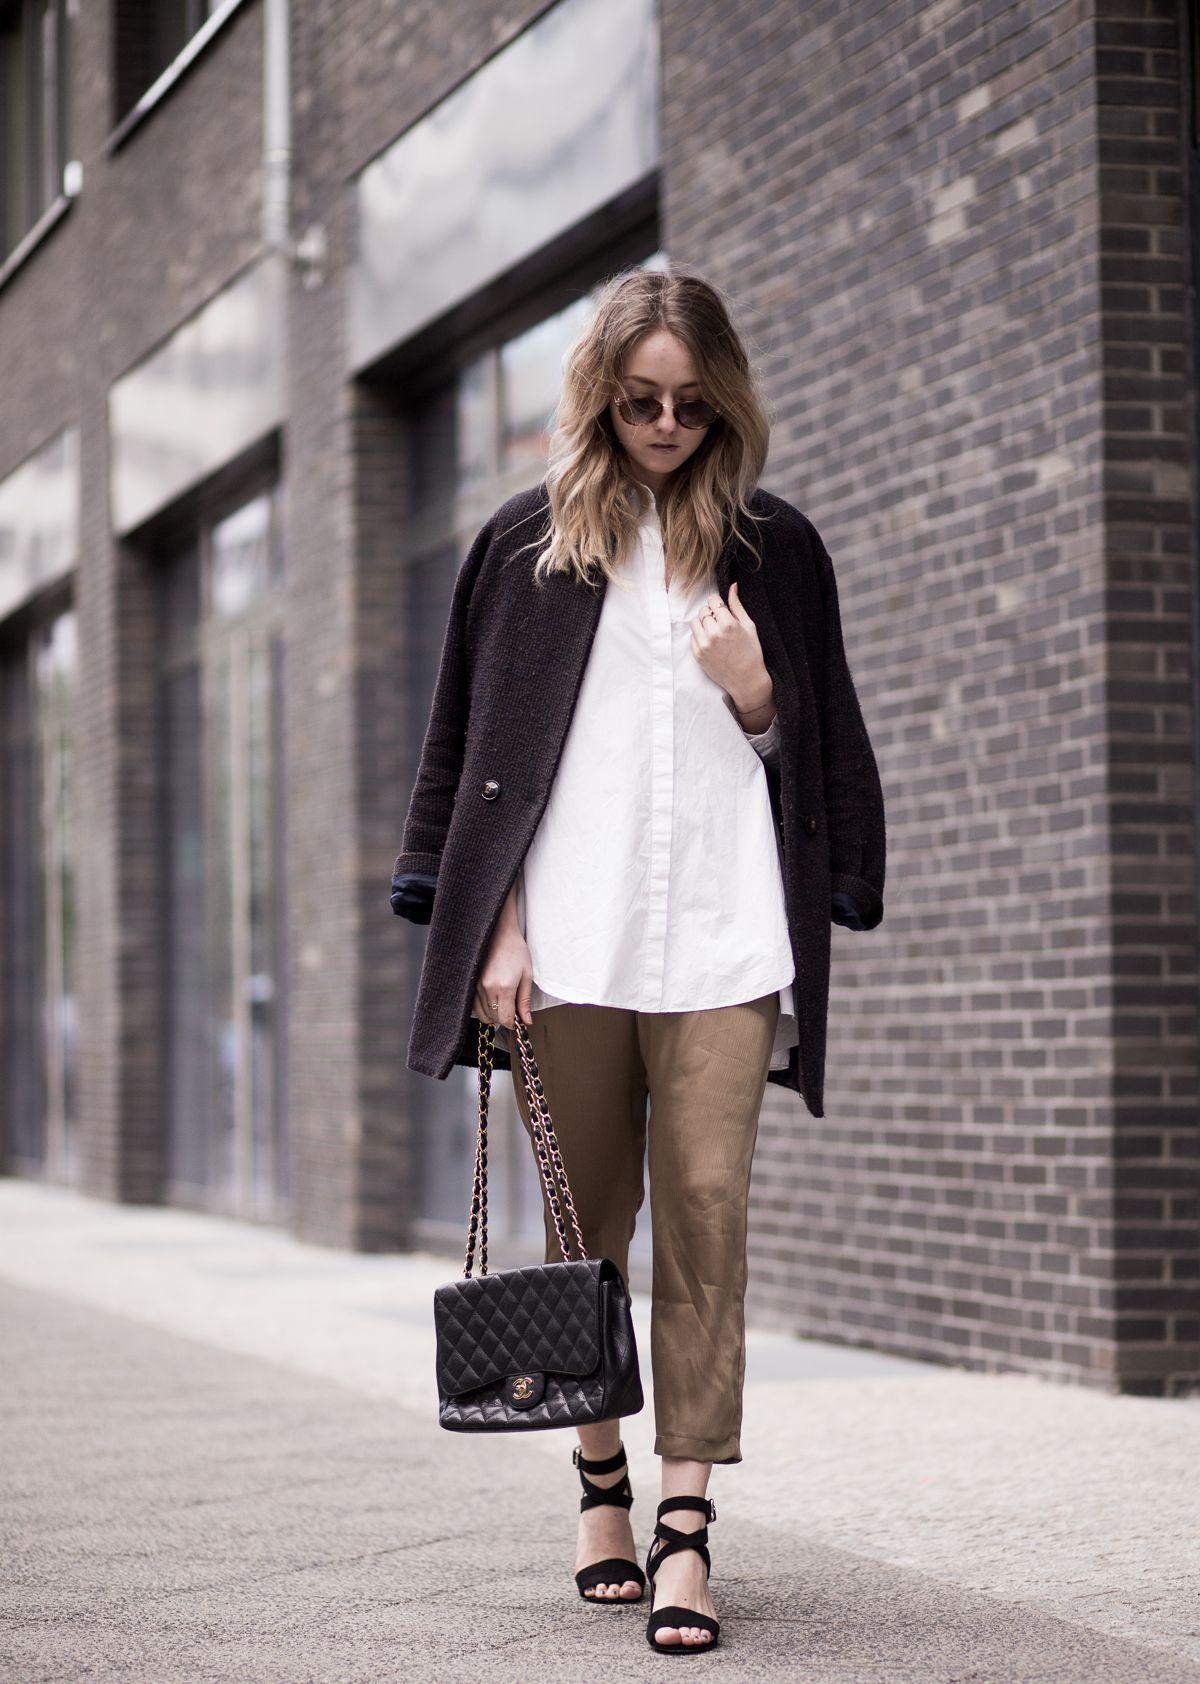 Chanel Berlin fashion fashionblogger berlin deutschland modeblog